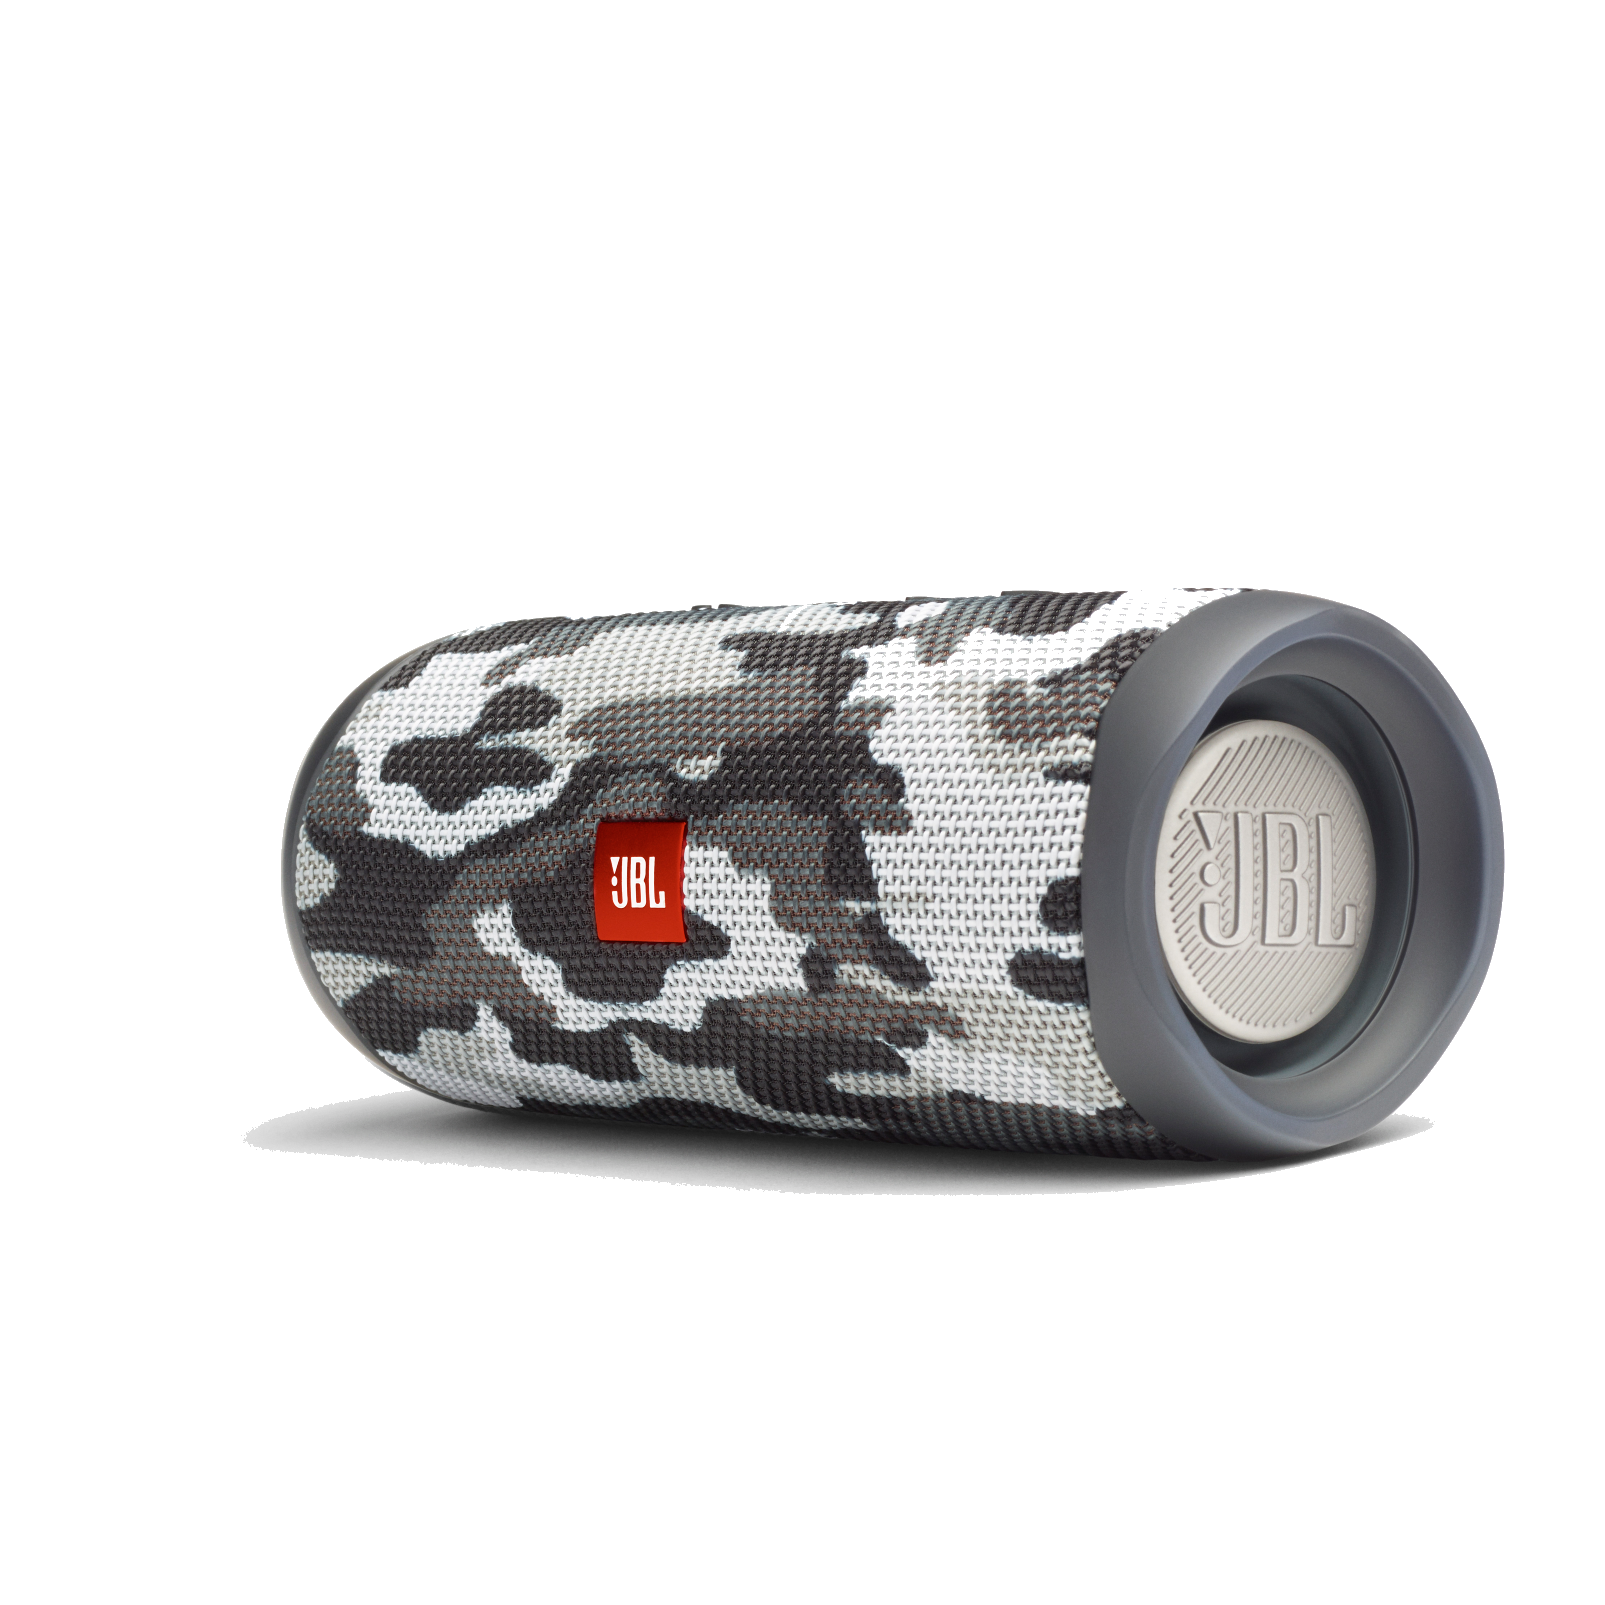 JBL FLIP 5 - Black Camo - Portable Waterproof Speaker - Detailshot 2